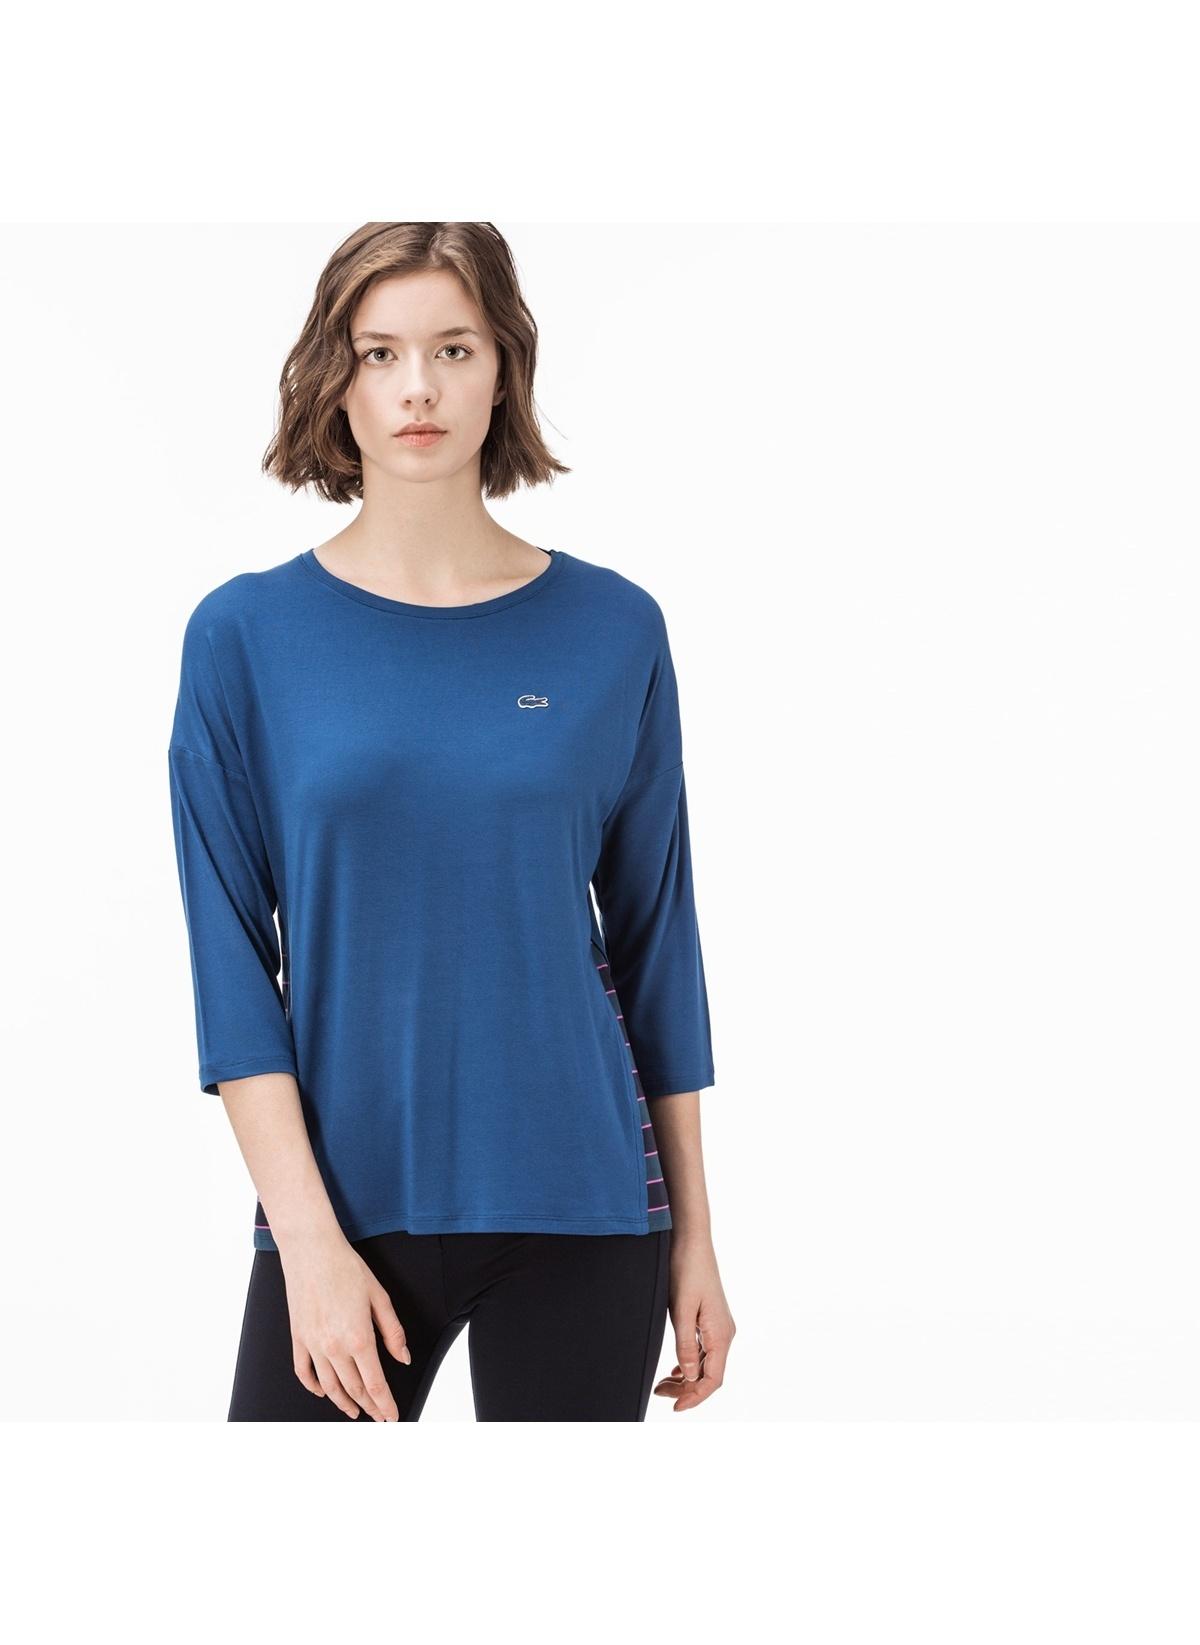 Lacoste Tişört Tf1902.02m T-shirt – 329.0 TL